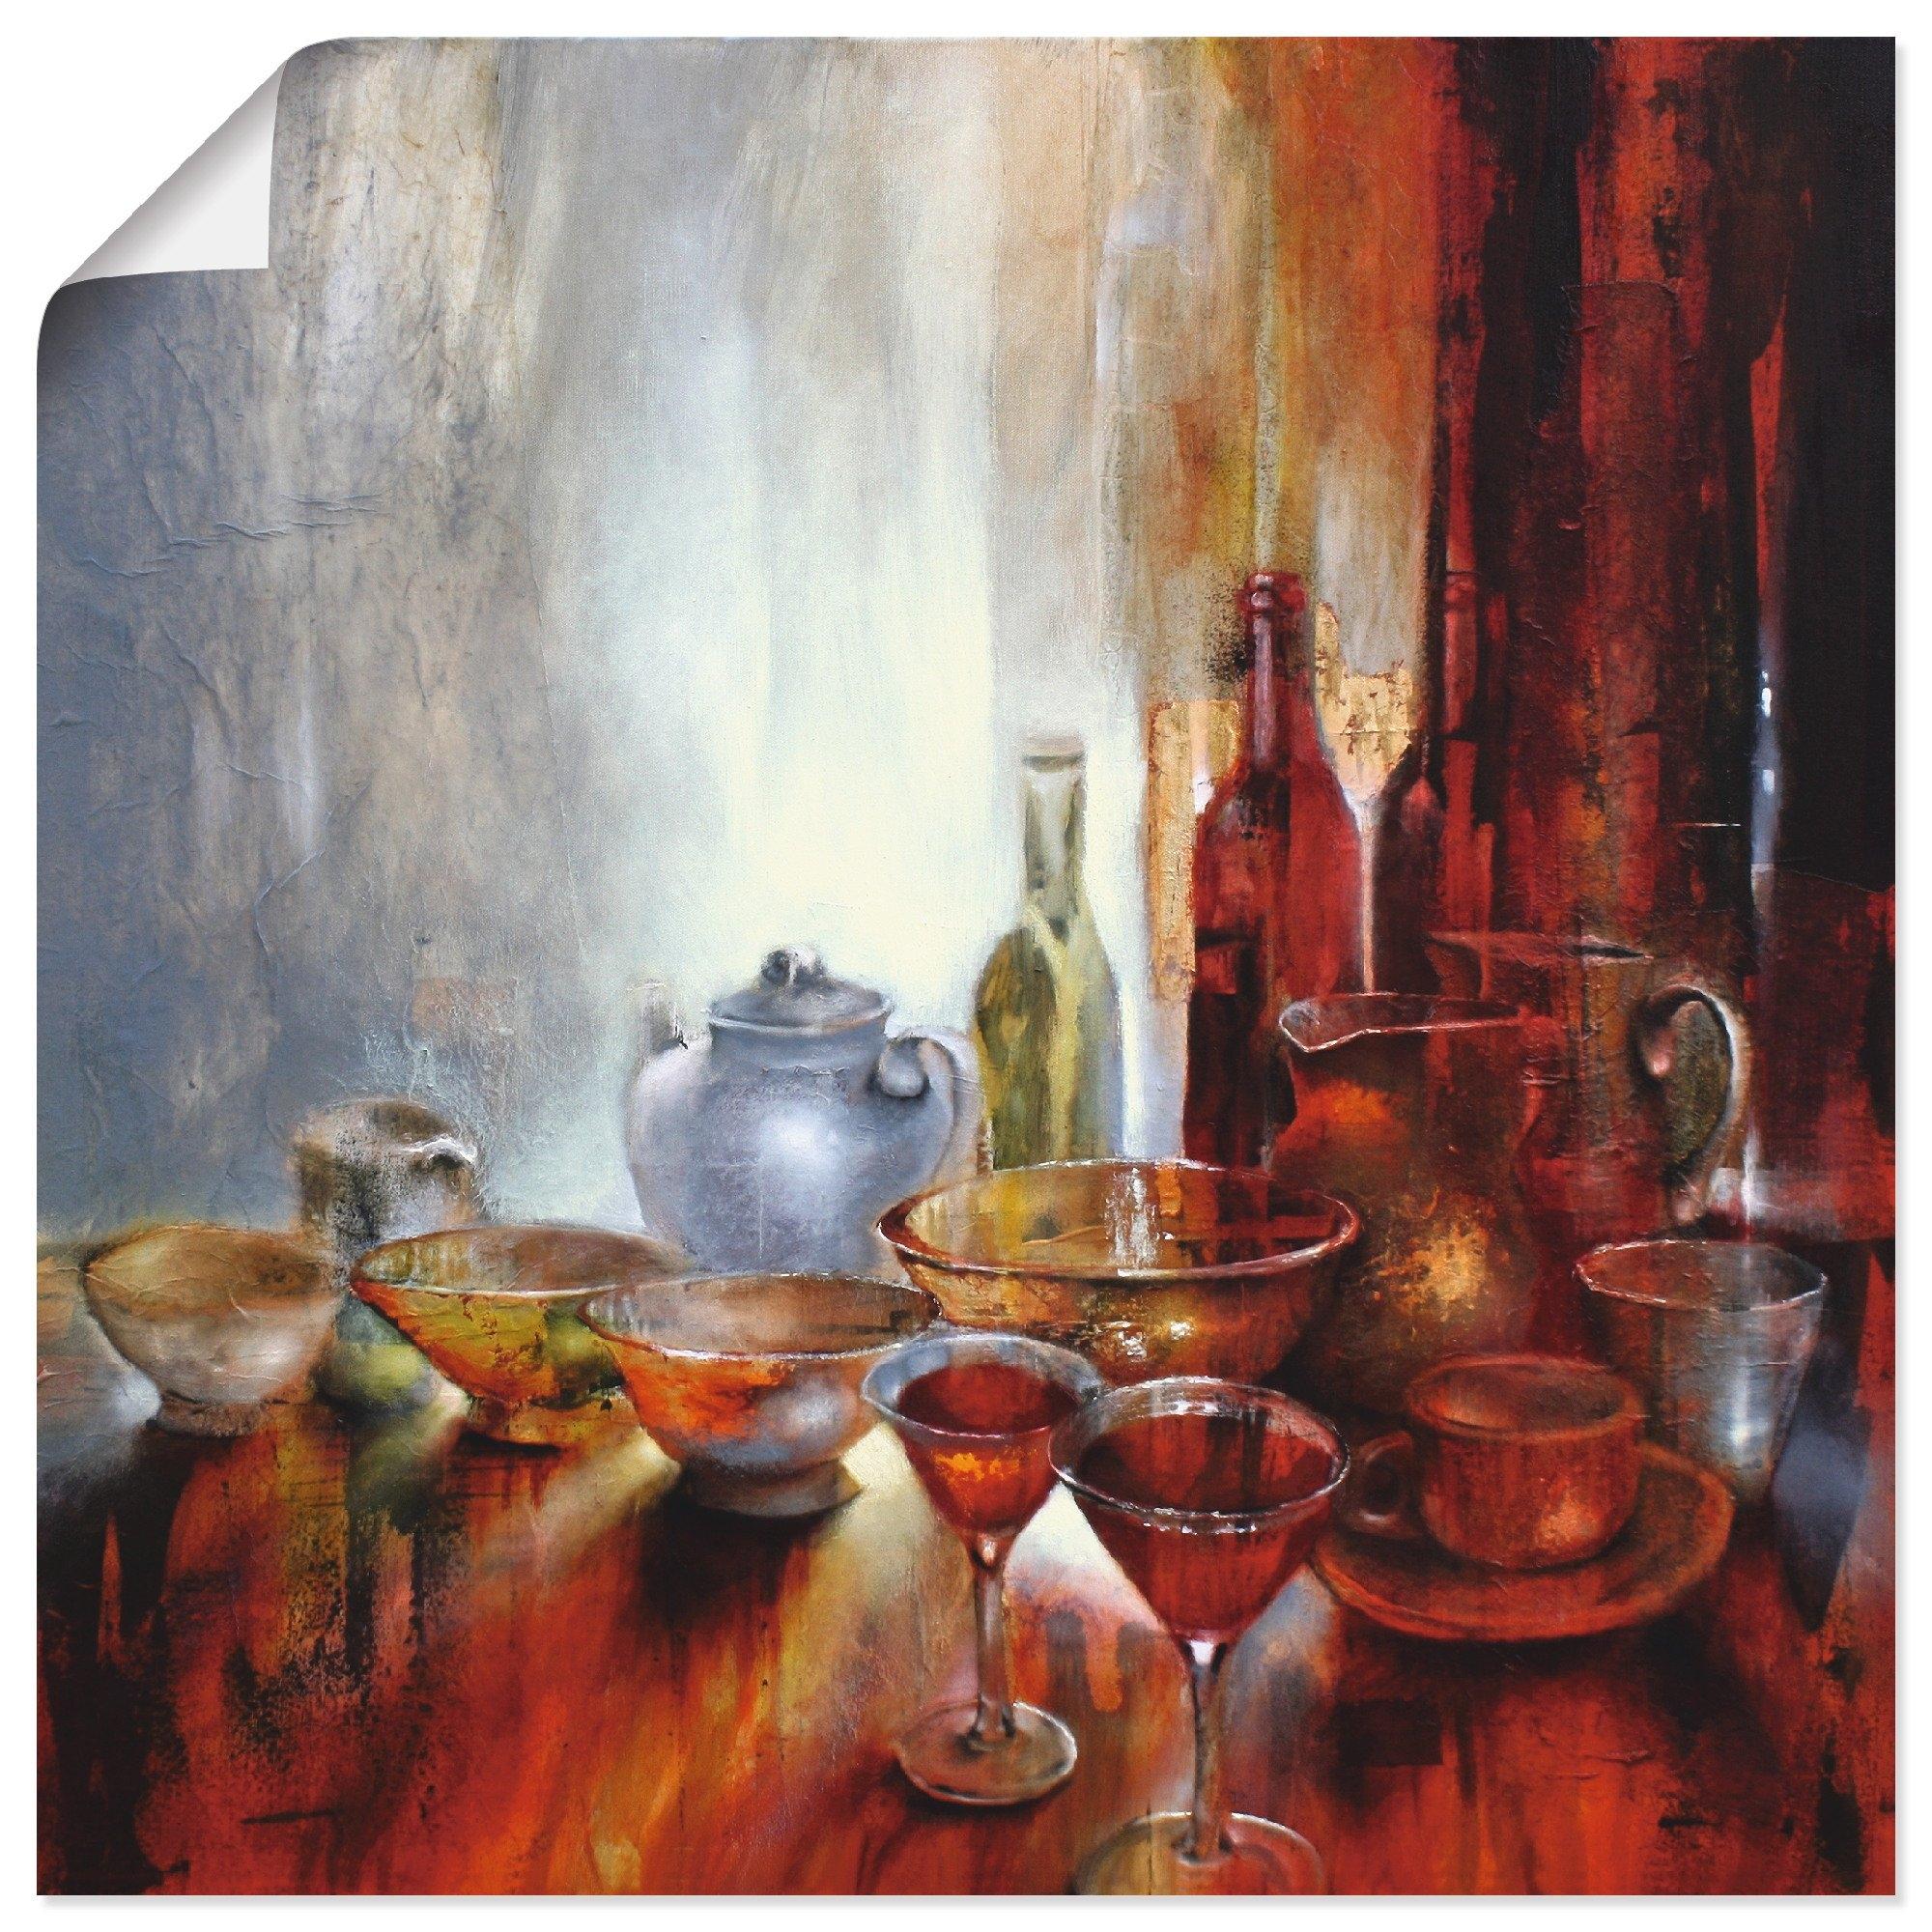 Artland artprint »Stillleben mit grauer Teekanne« goedkoop op otto.nl kopen